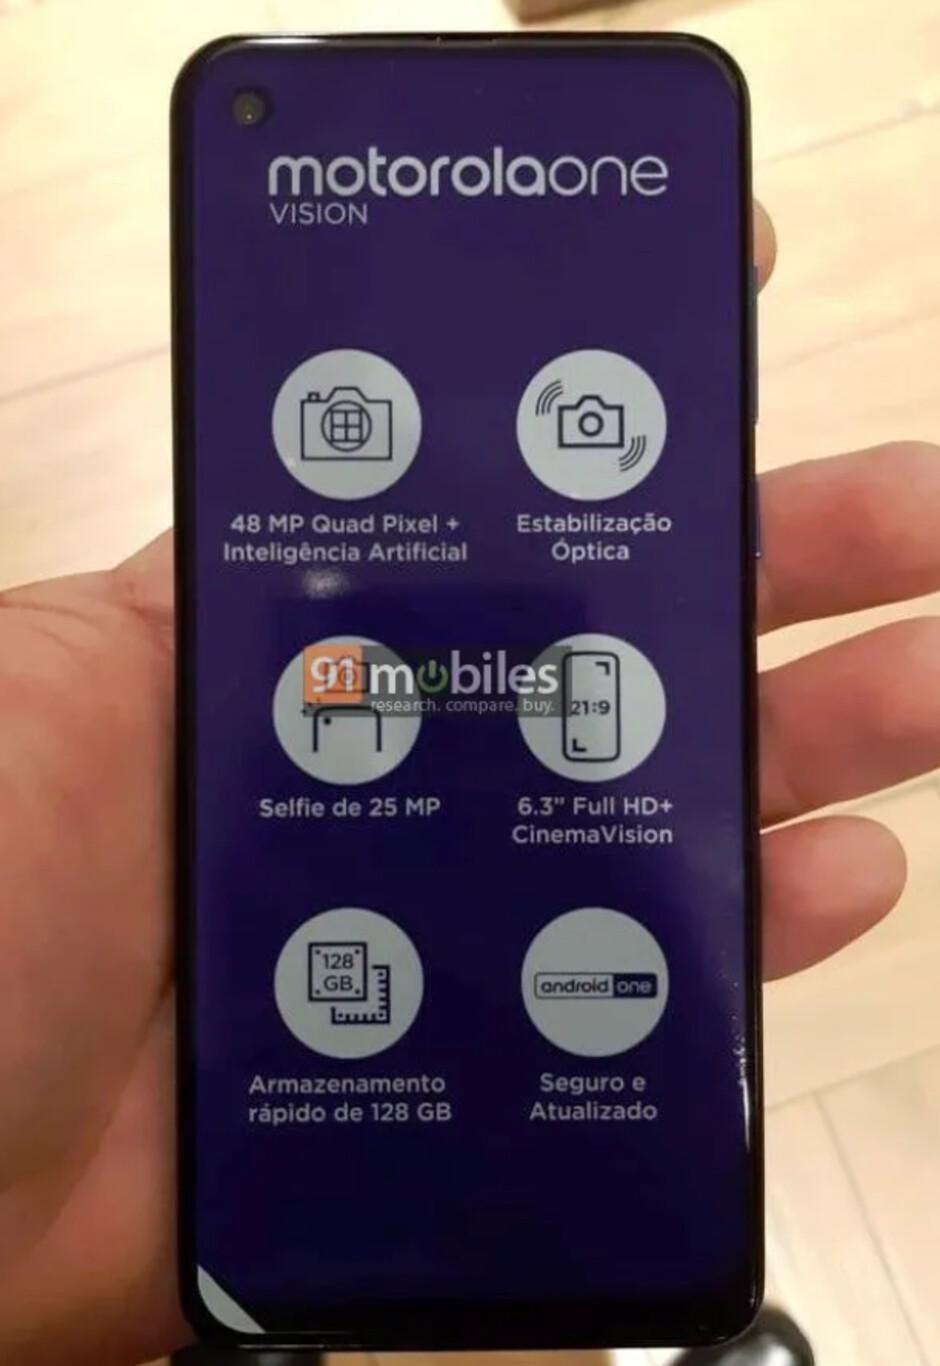 Motorola One Vision hands-on image leaks, key specs corroborated